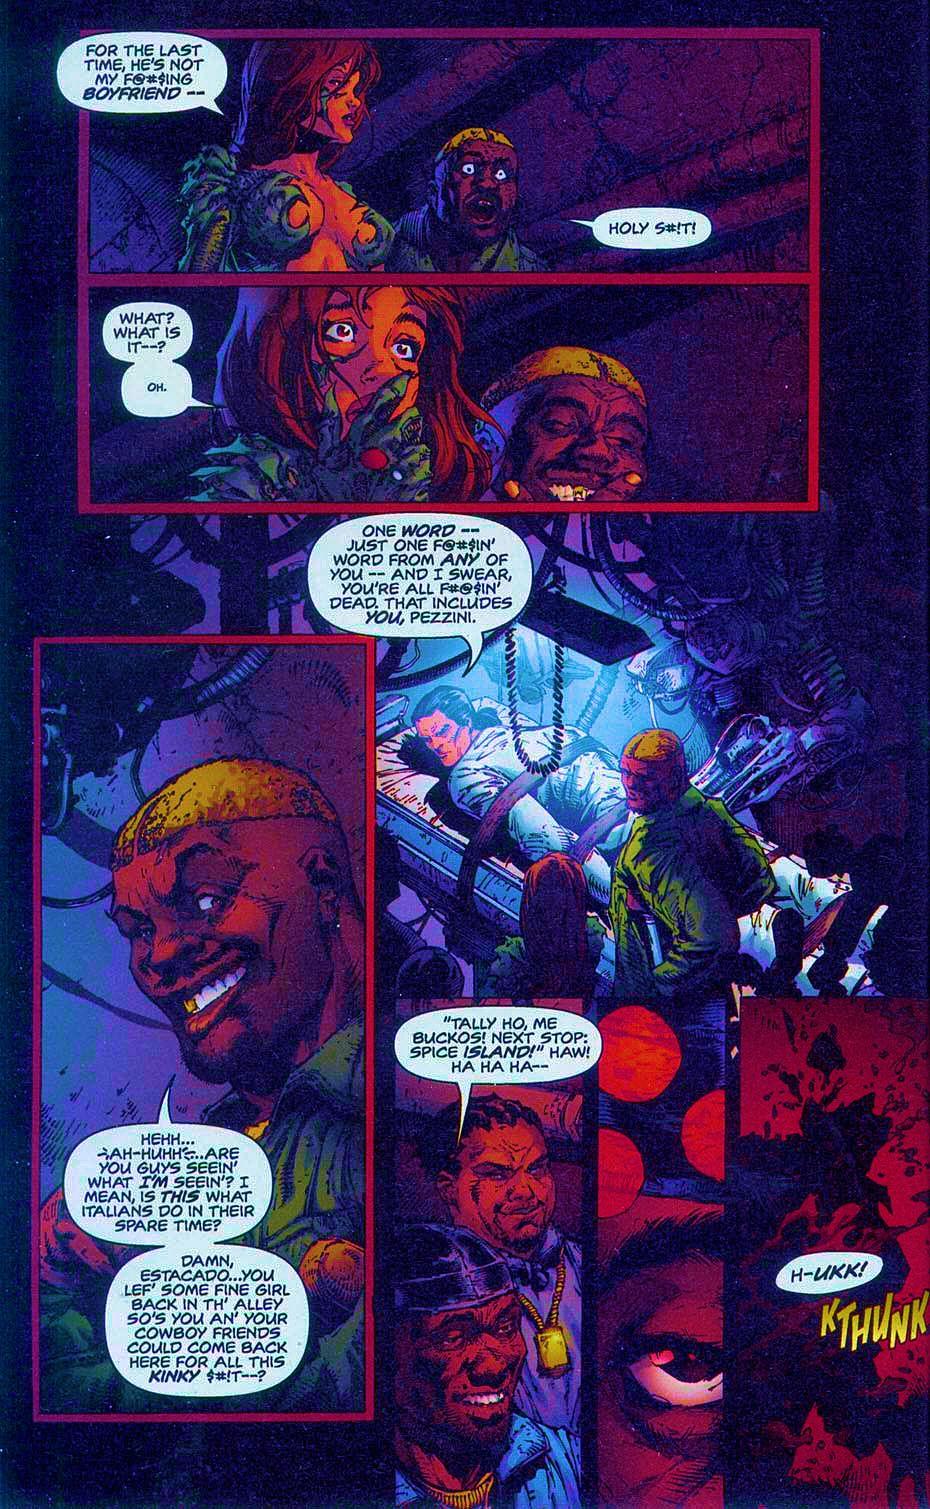 Read online Overkill: Witchblade/Aliens/Darkness/Predator comic -  Issue #2 - 25